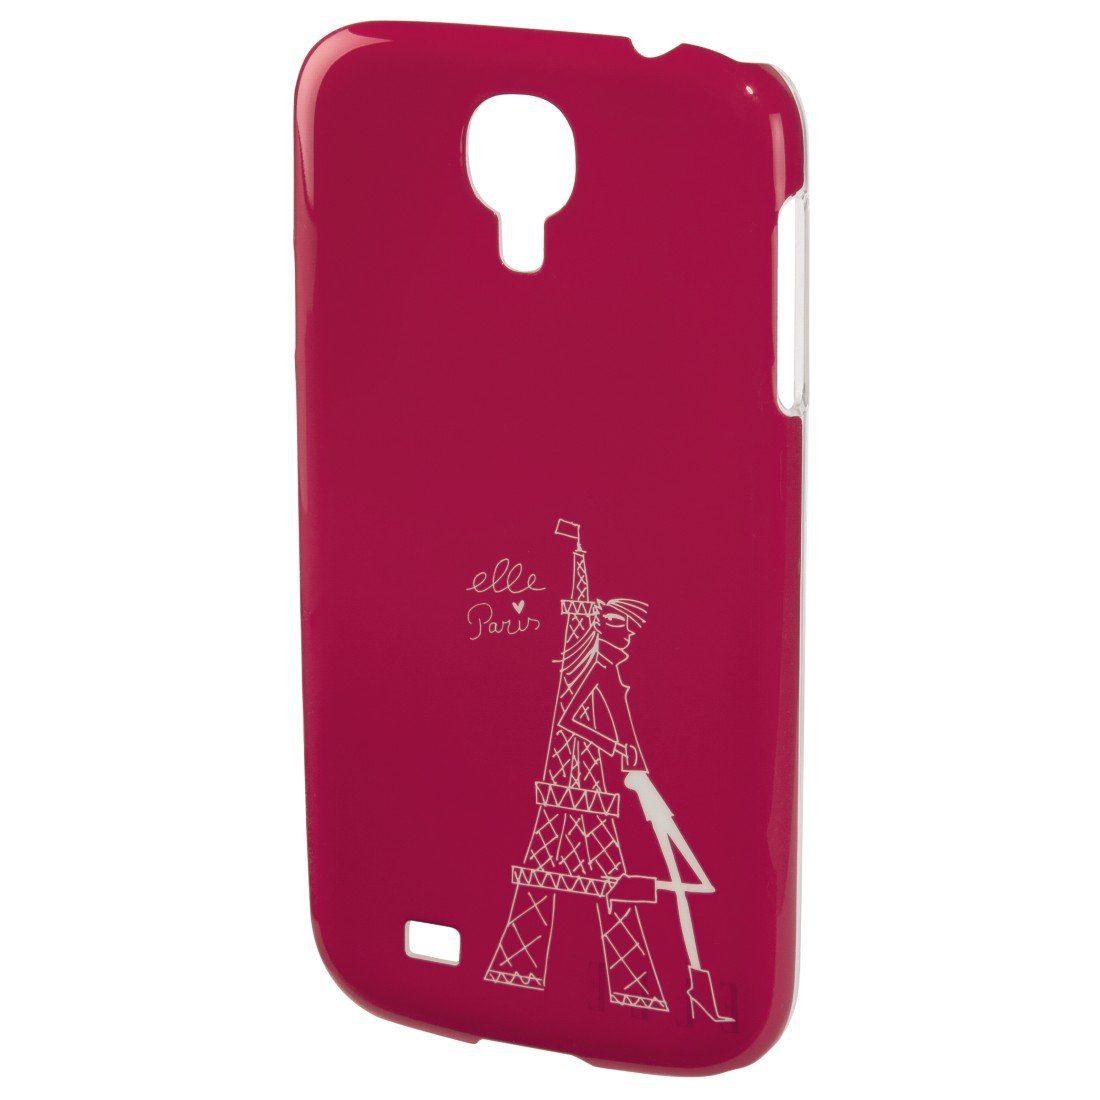 ELLE Handy-Cover Tour Eiffel für Samsung Galaxy S 4 mini, Pink